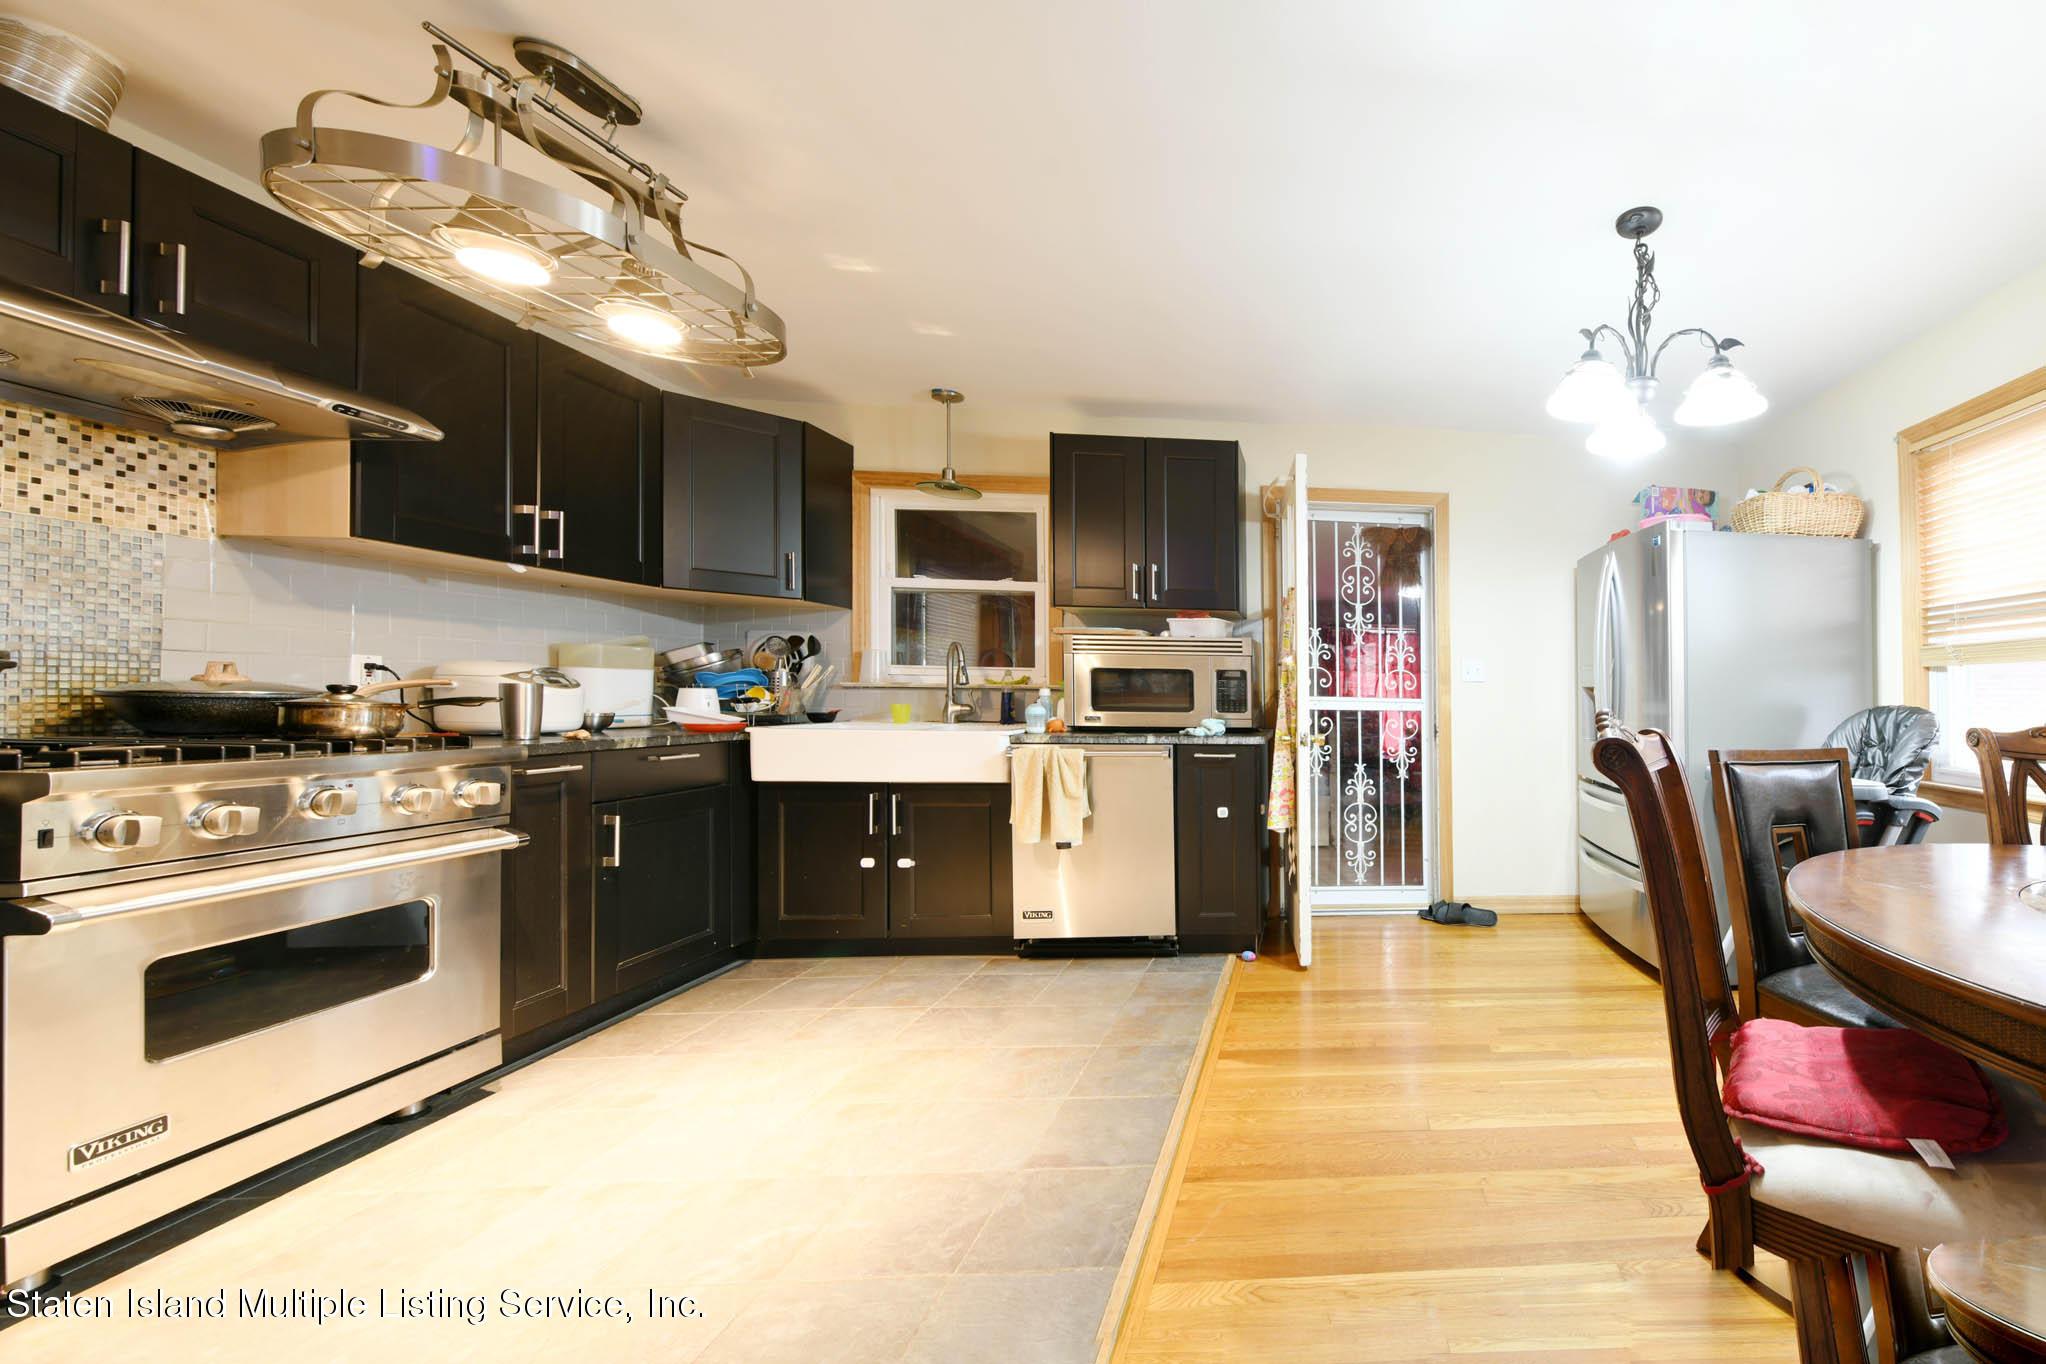 Single Family - Detached 110 Ravenhurst Avenue  Staten Island, NY 10310, MLS-1143189-5